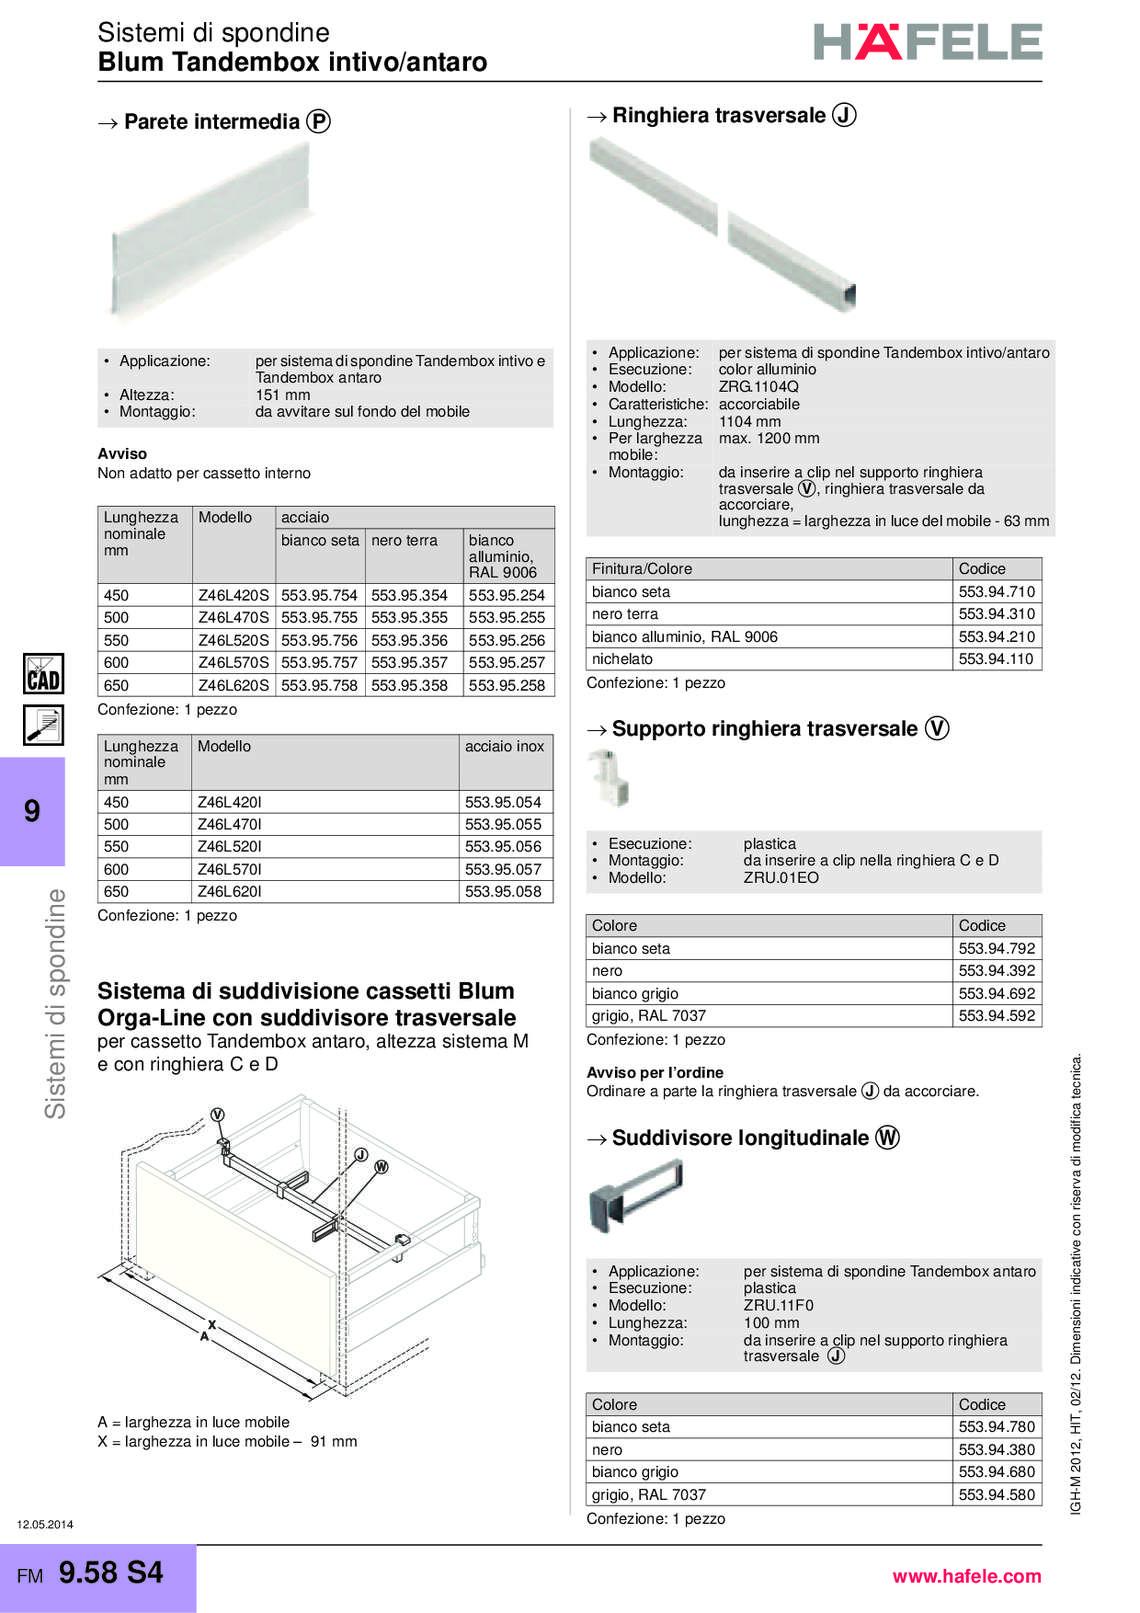 hafele-spondine-e-guide-per-mobili_40_097.jpg